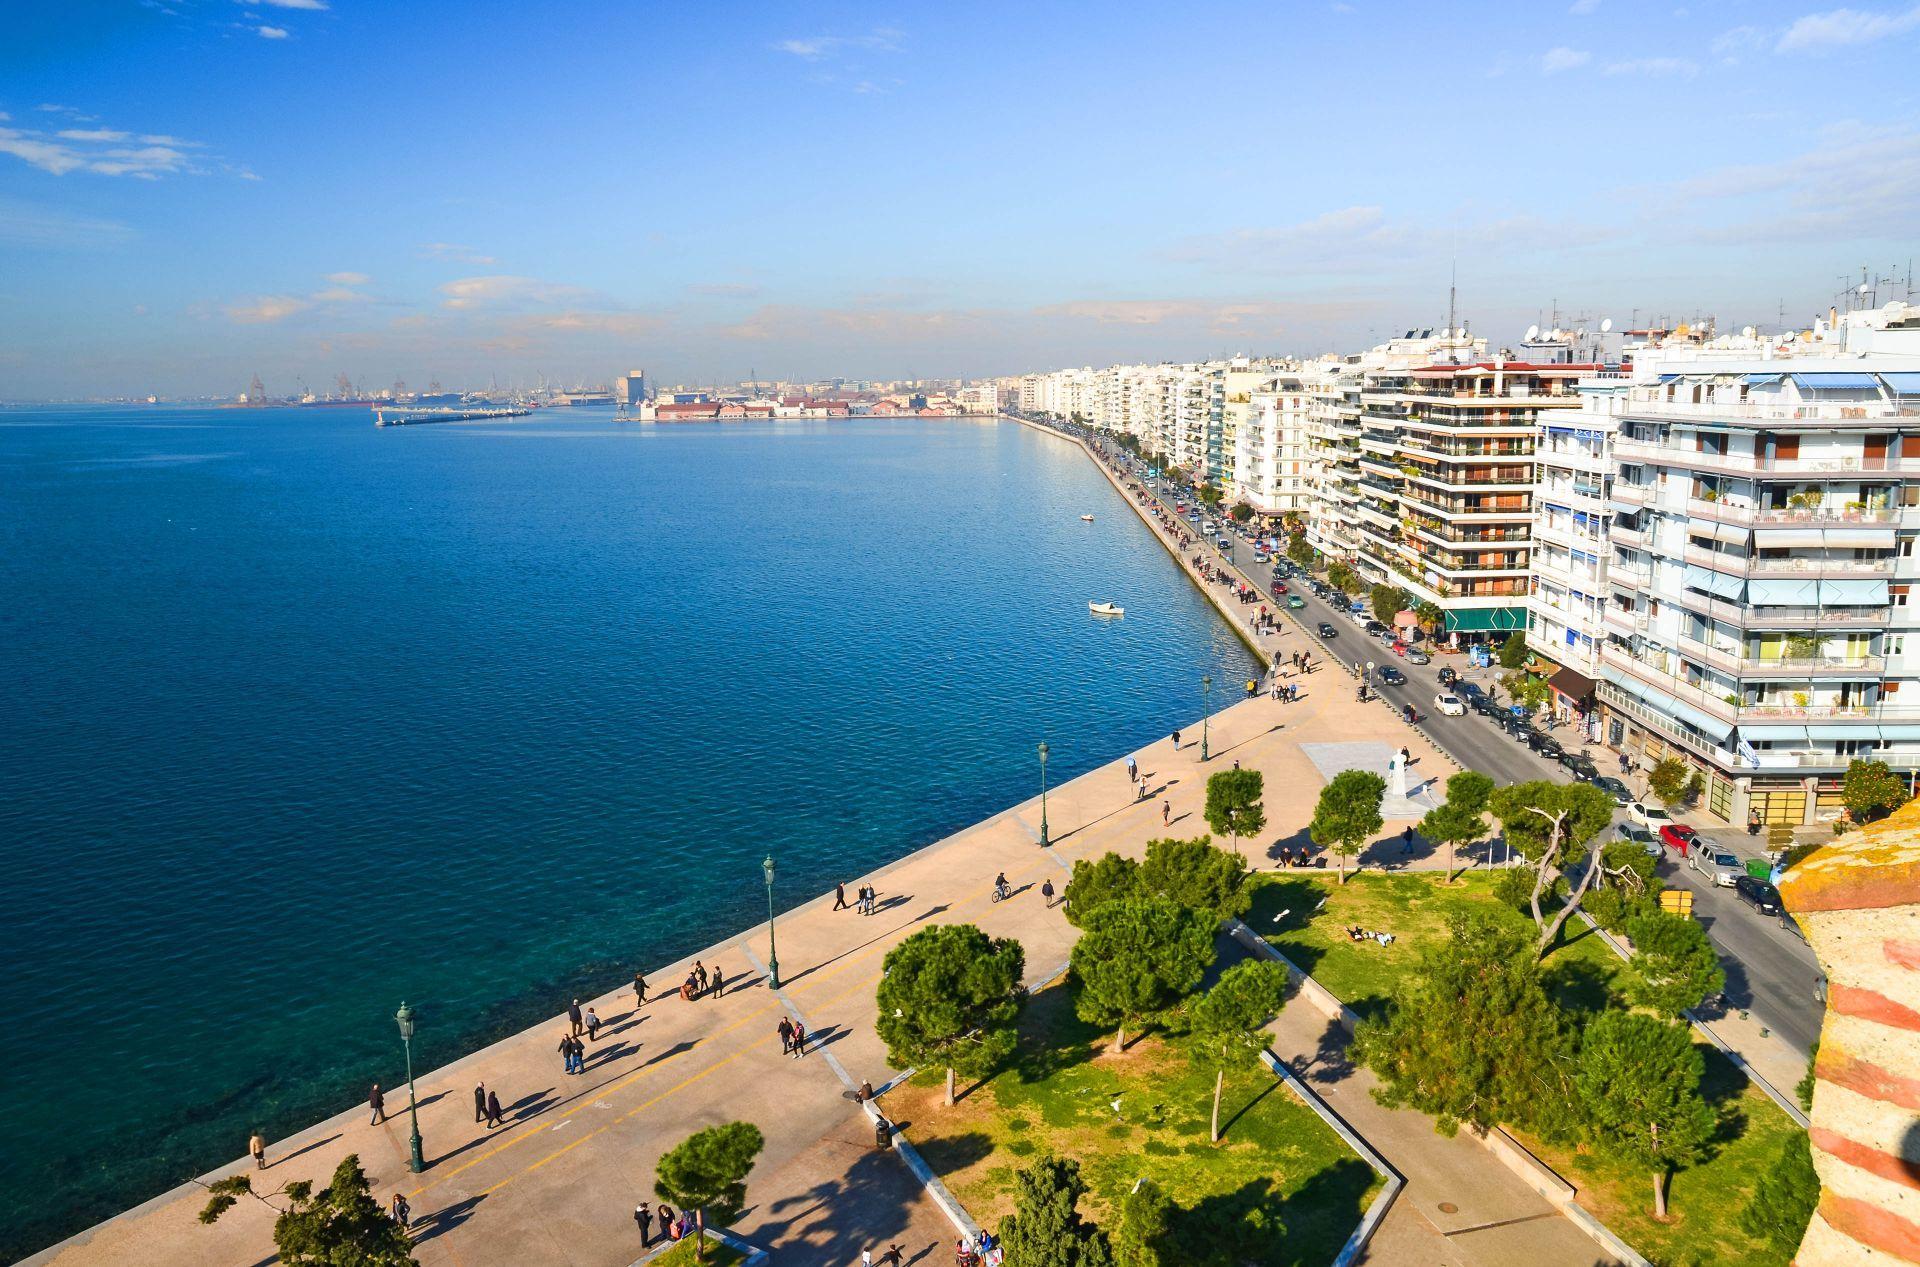 Macedonia: Thessaloniki beach Promenade